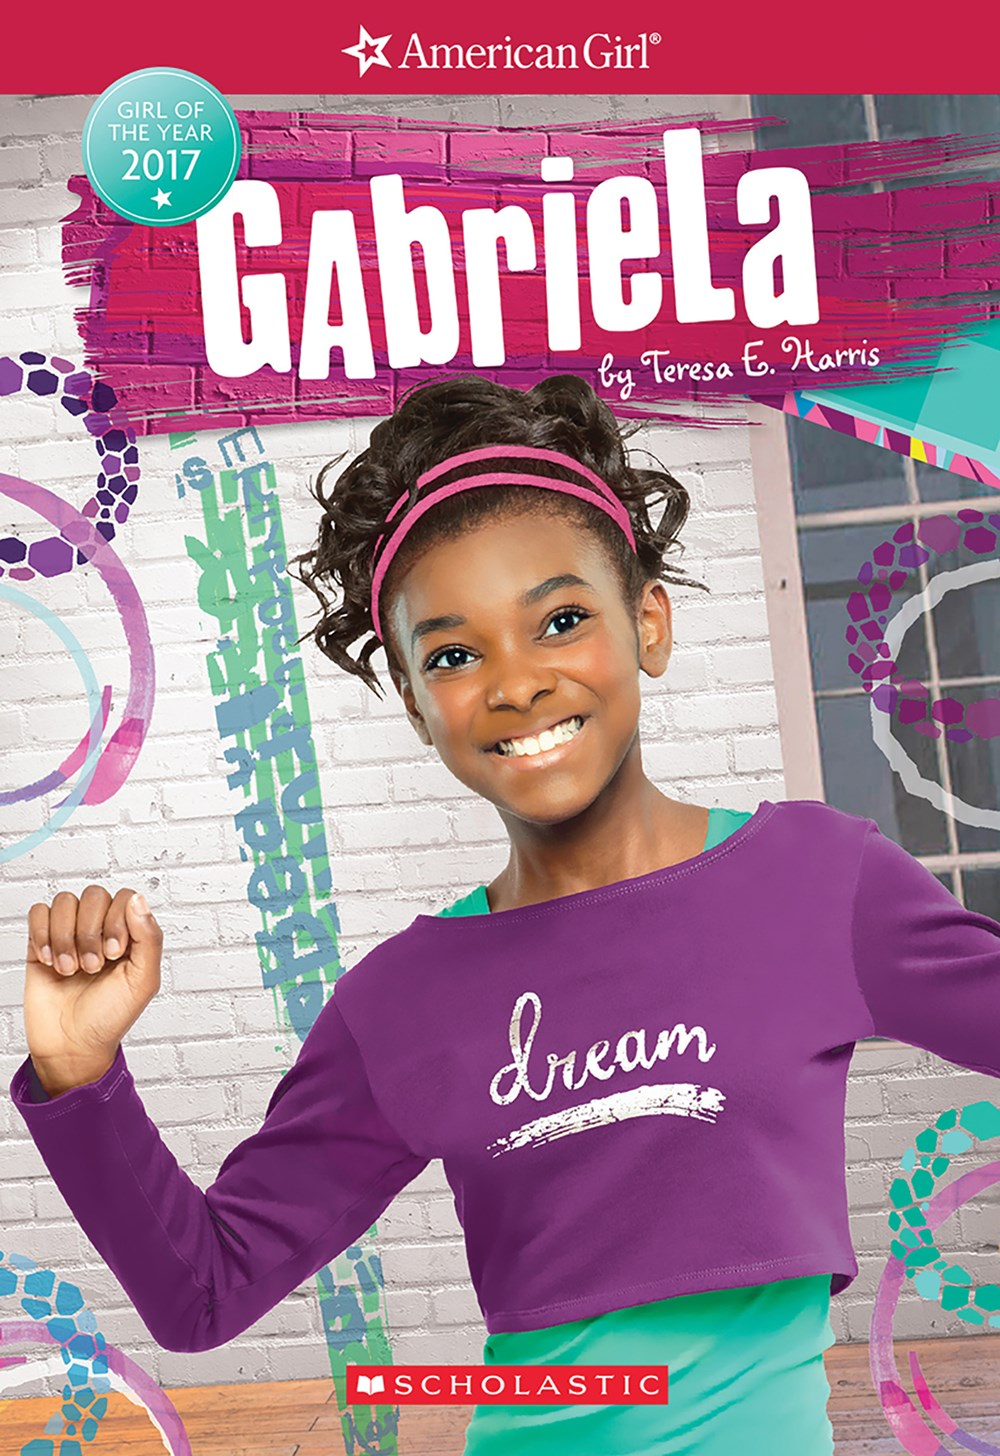 Americangirl-gabriela